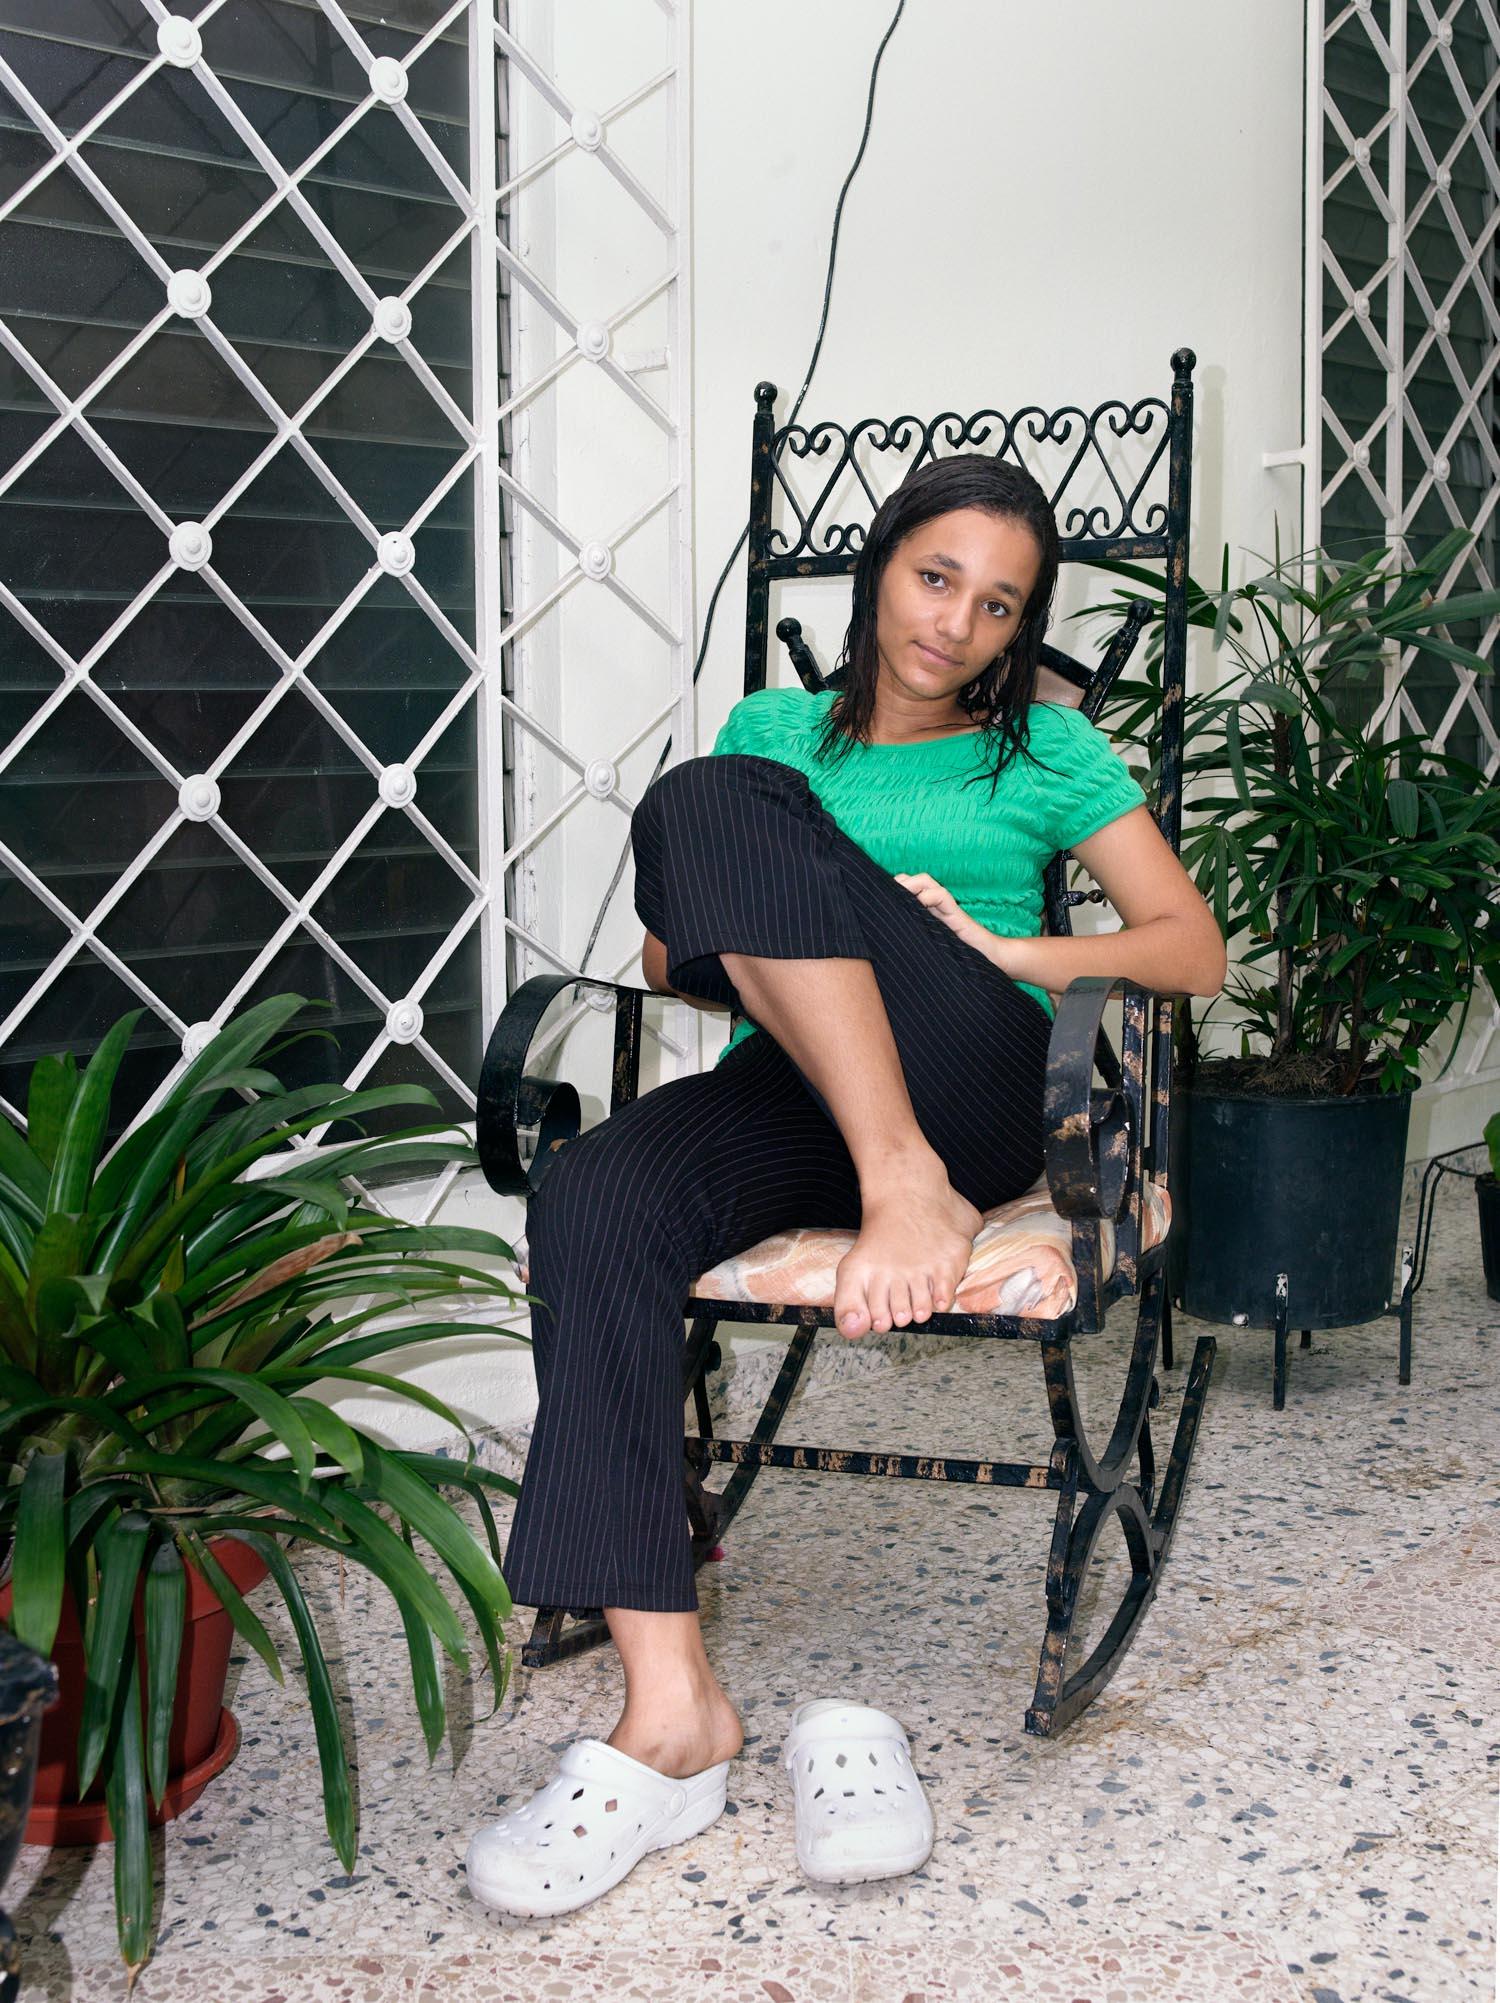 Laura on the Porch, 2008. Gazcue, Santo Domingo, R.D.